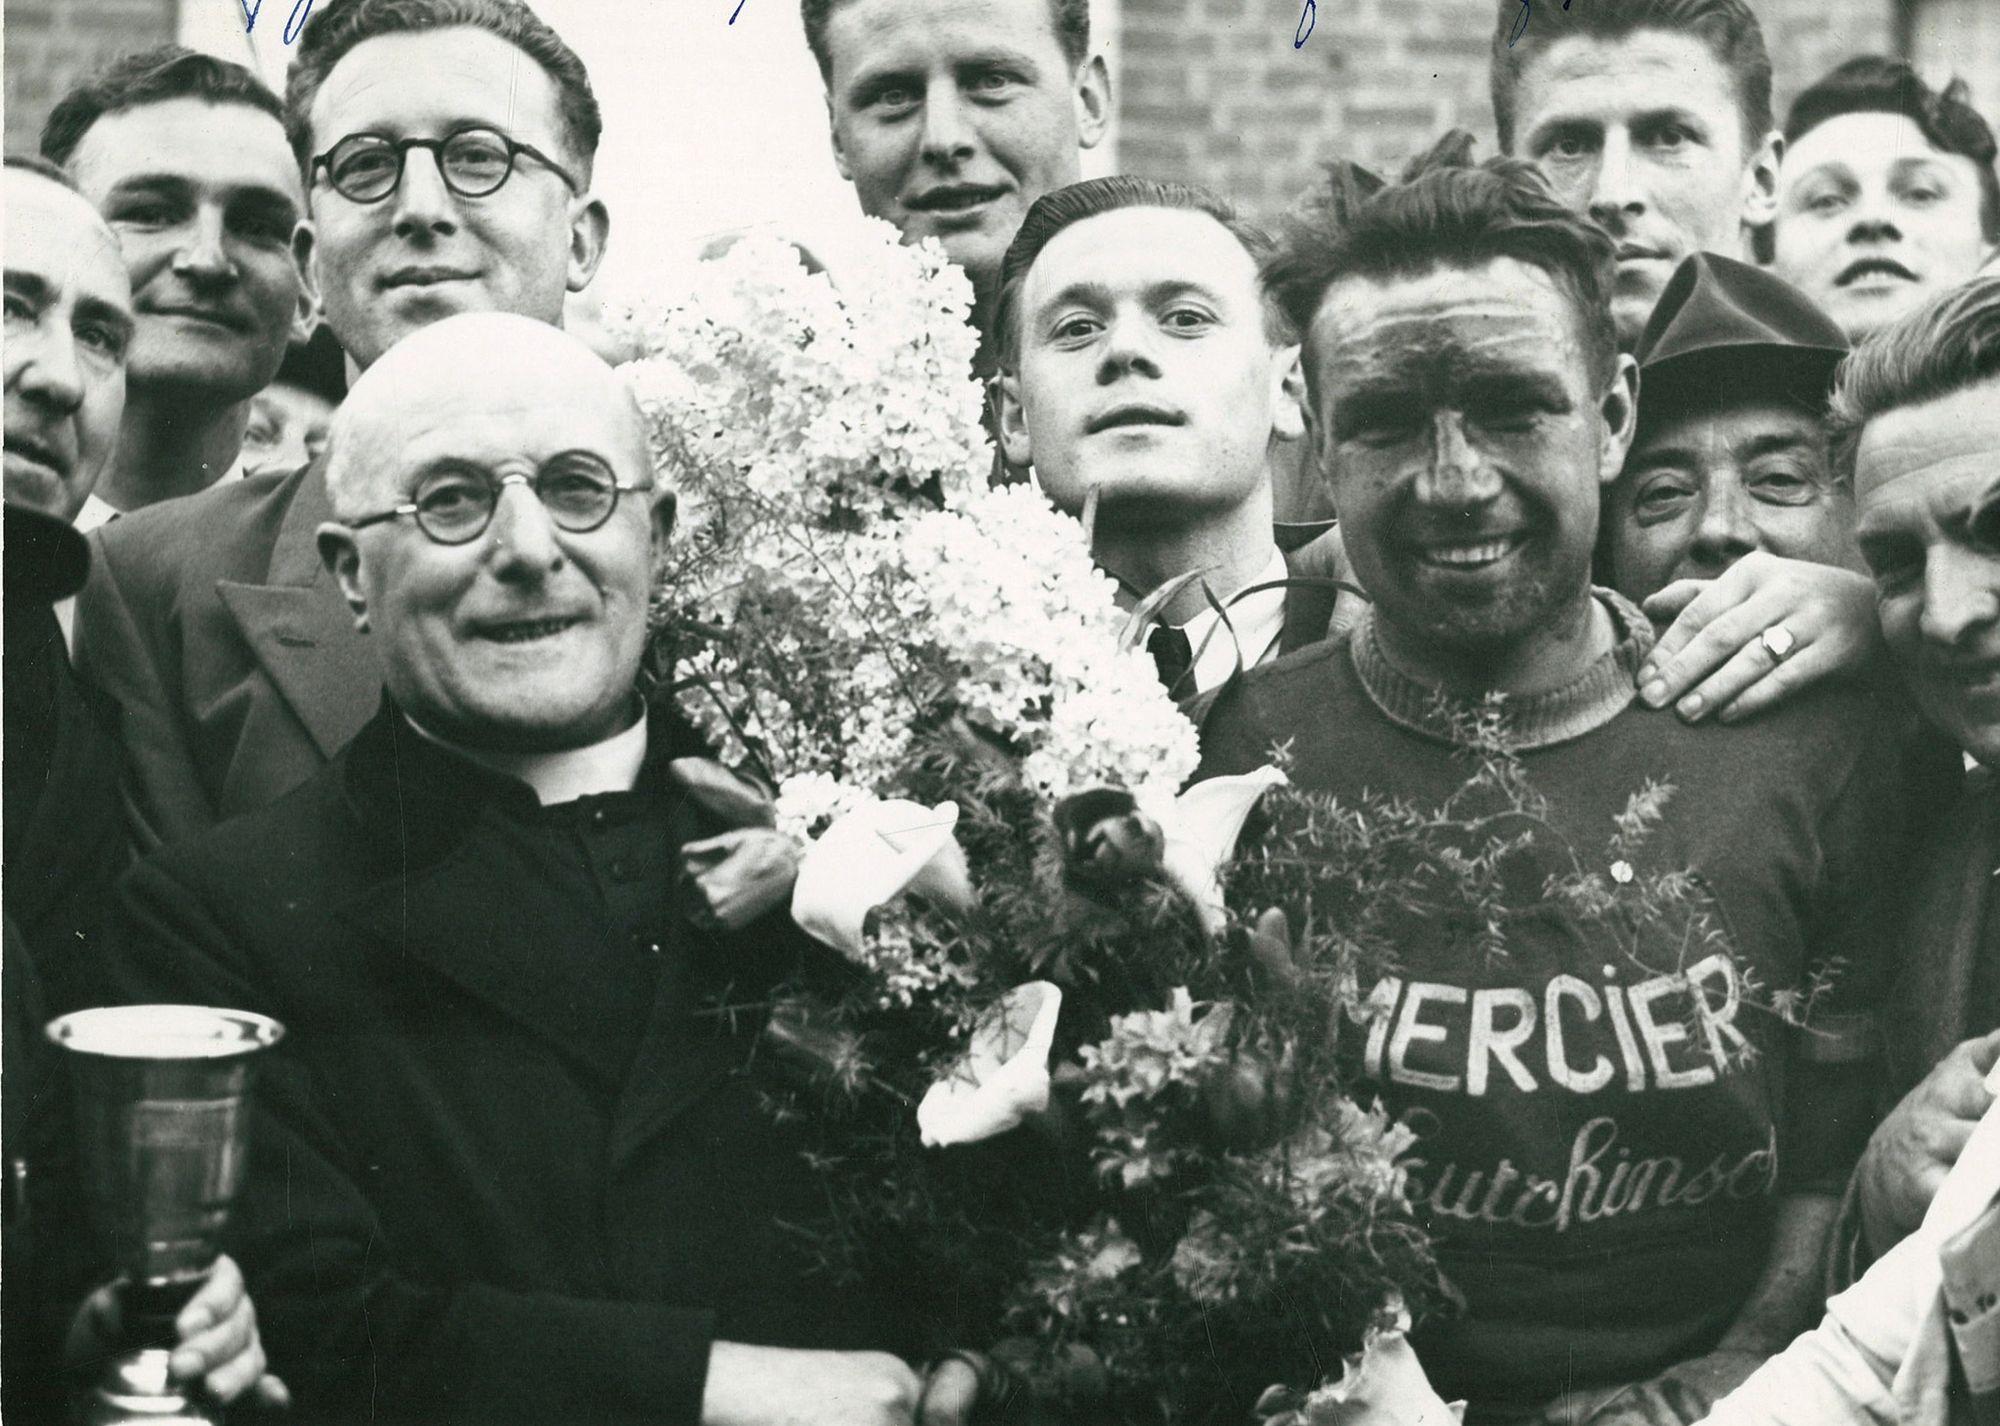 Brugge 1951, beroepsrenner Leopold Degraveleyn